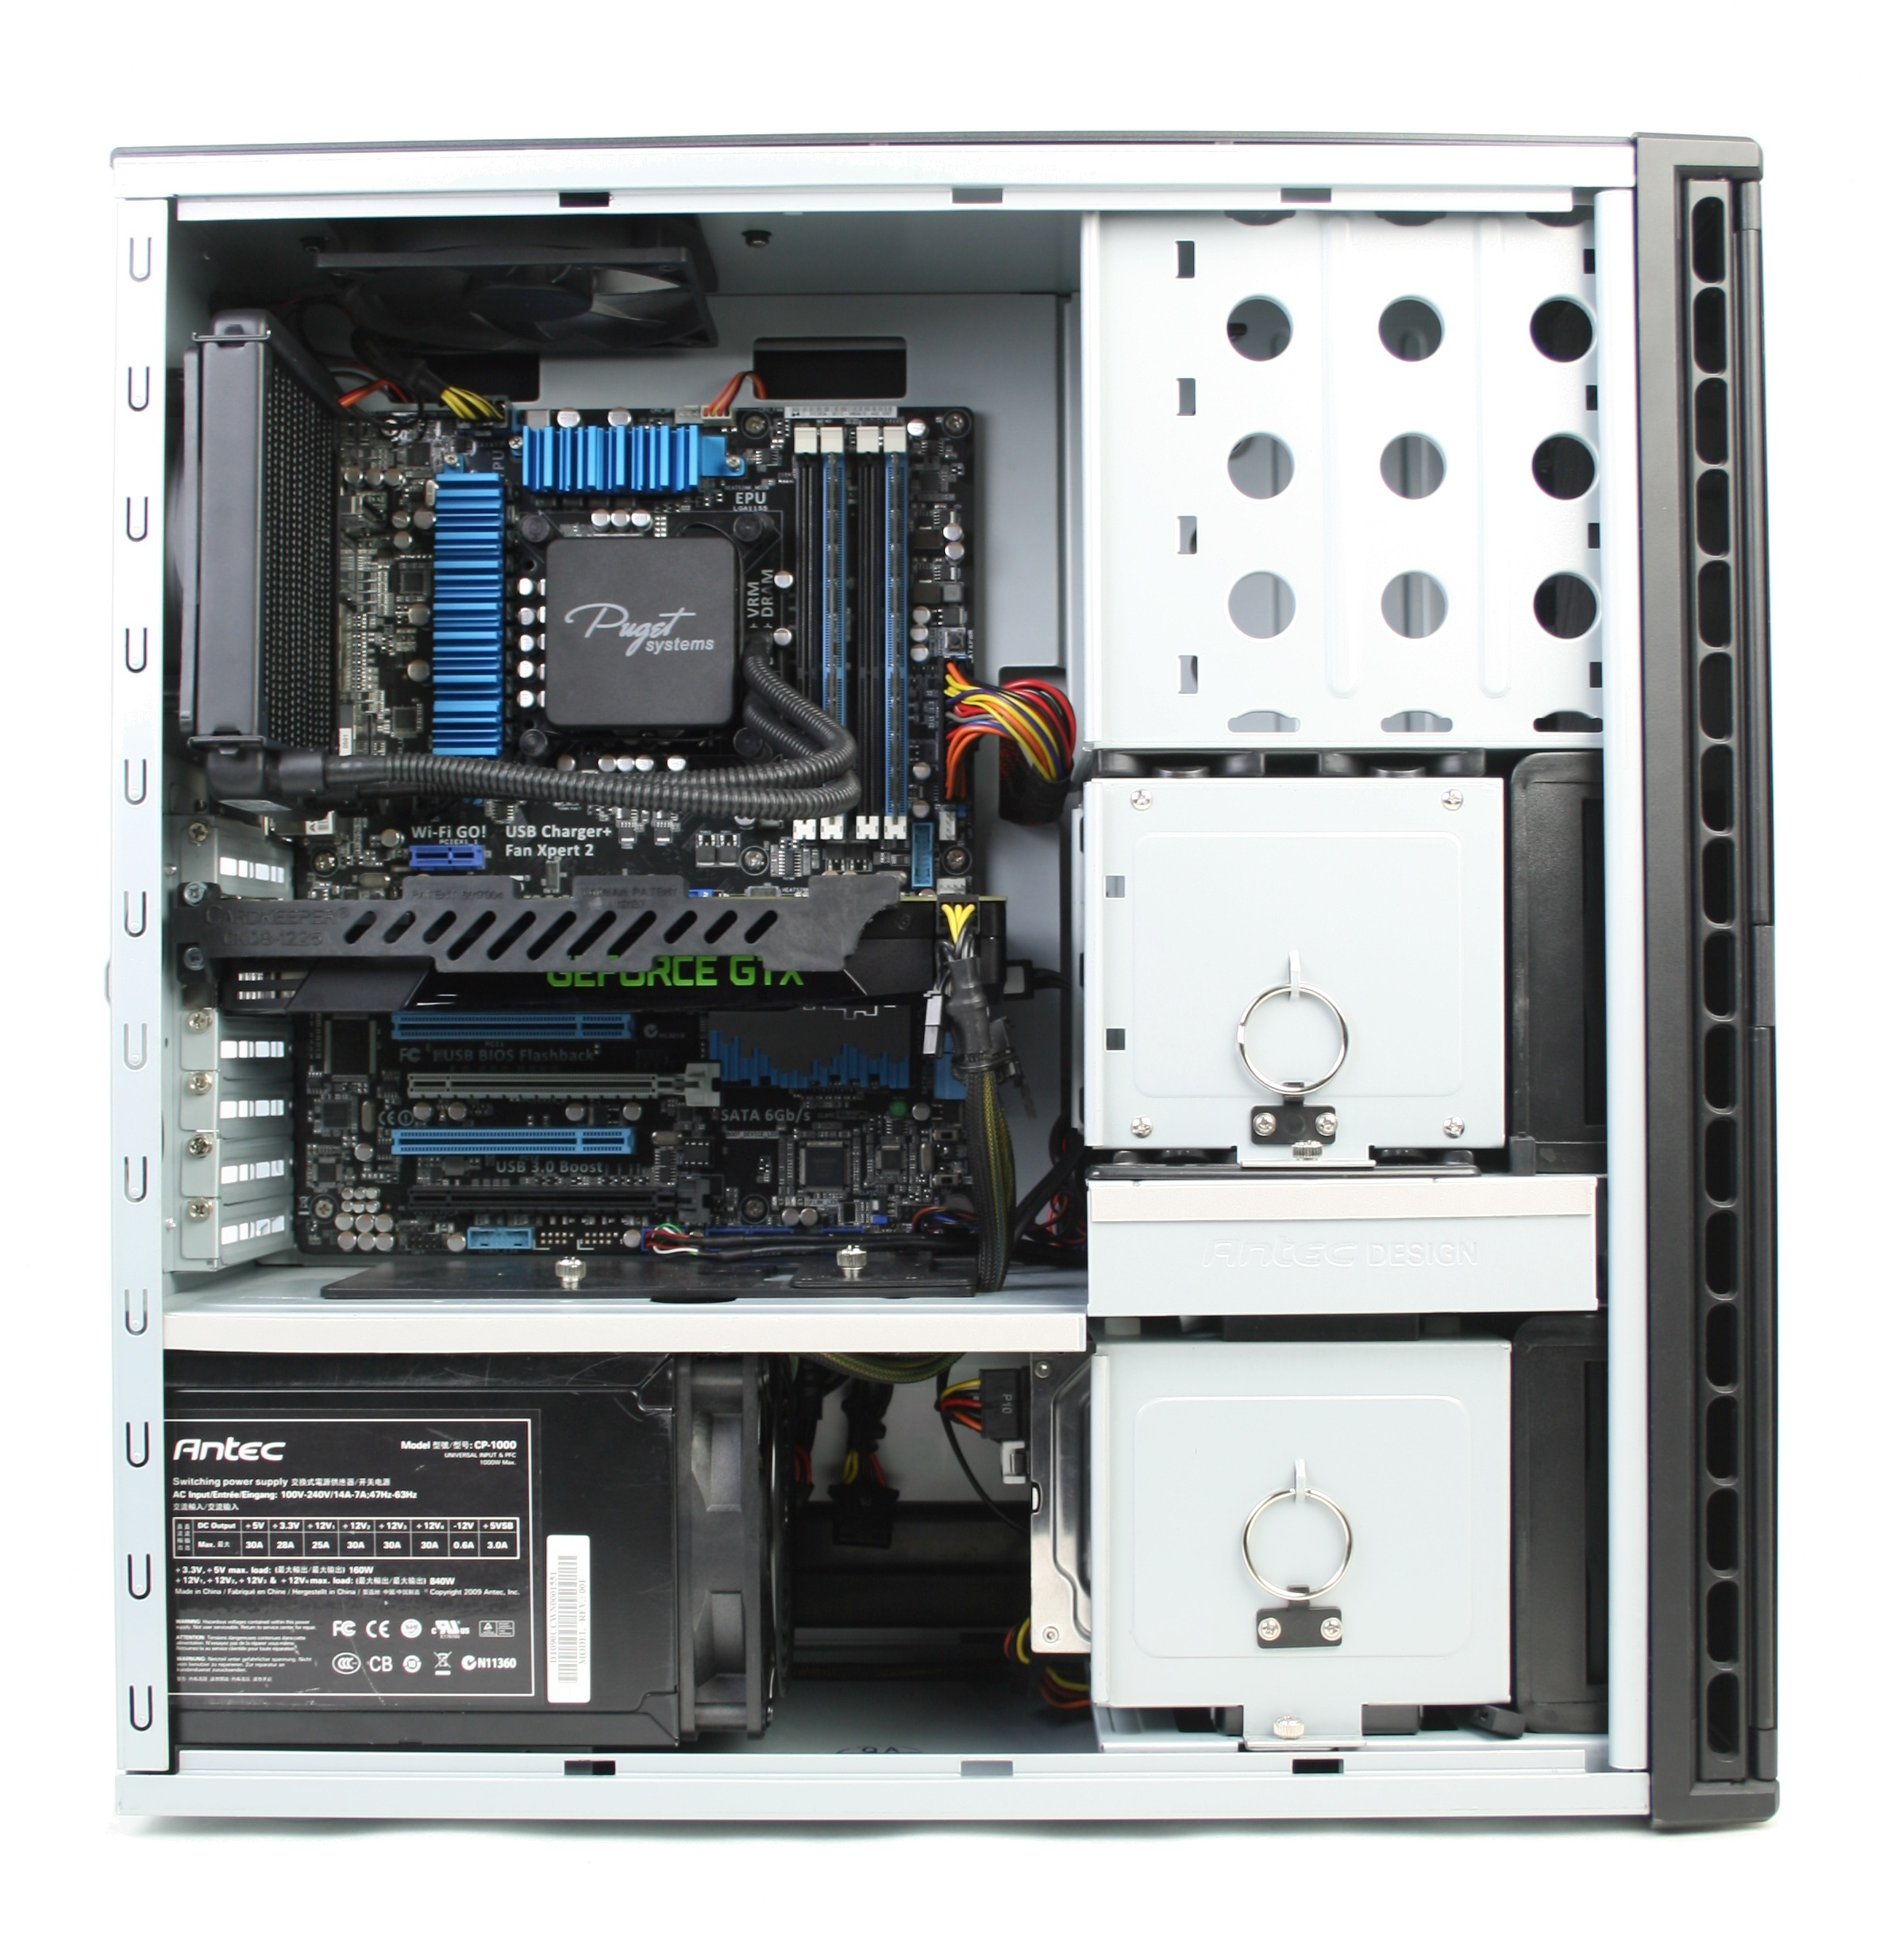 Asus P8Z77-V Pro install in an Antec P183 V3